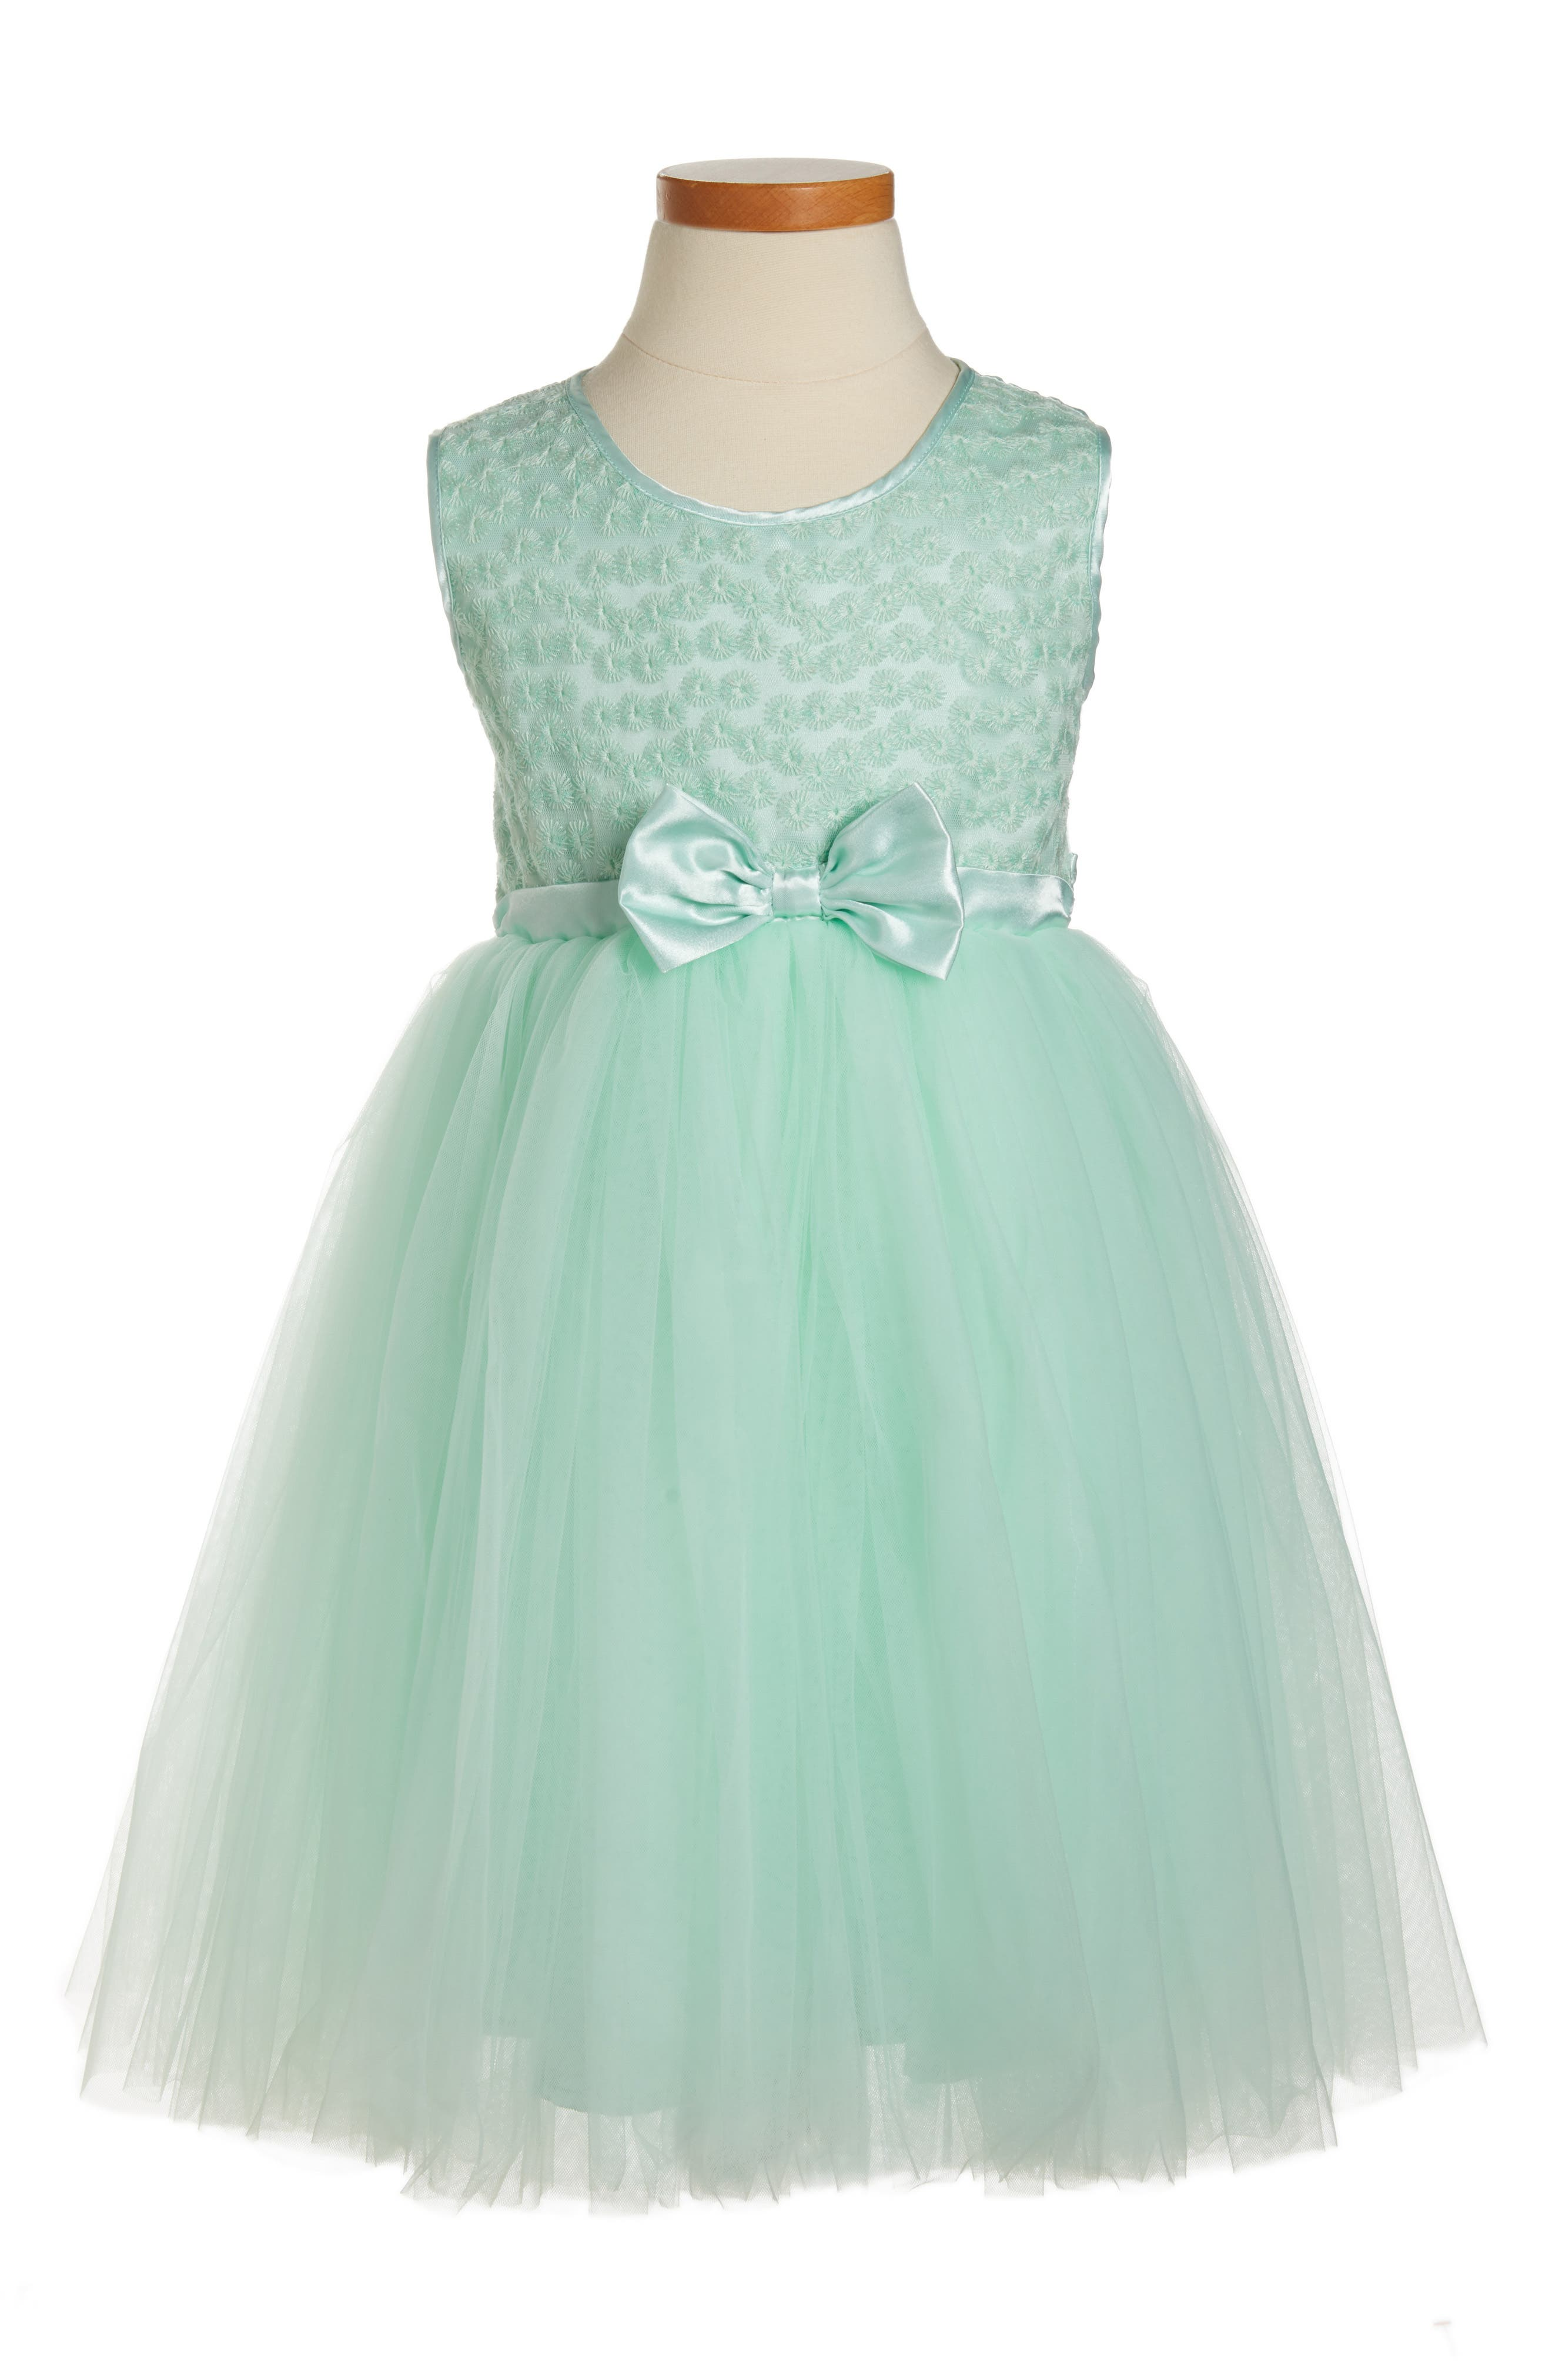 Little Girls Green Dresses